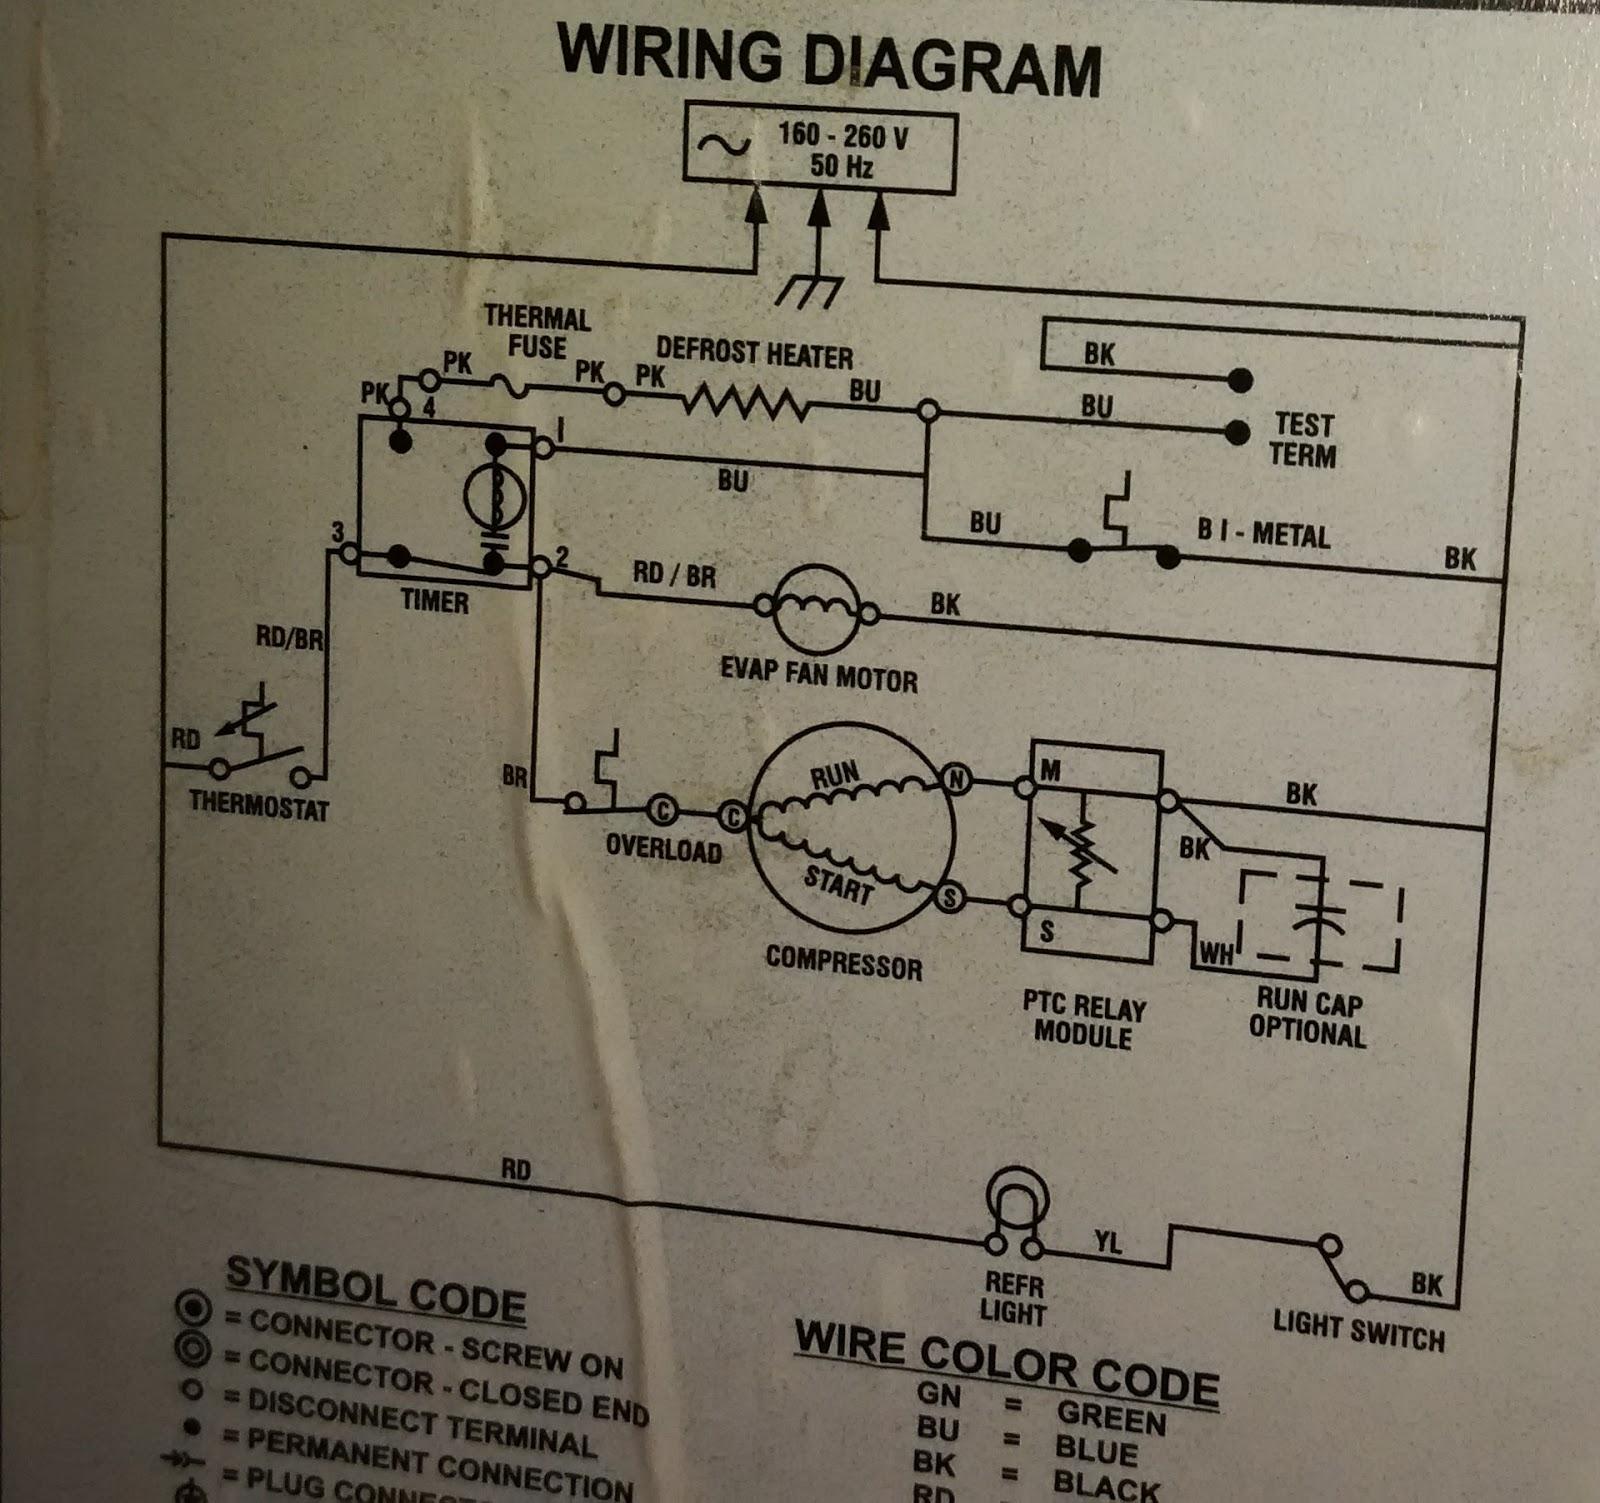 FX_5047] Bpl Double Door Refrigerator Wiring Diagram Free DiagramCular Geis Push Grebs Dogan Rele Mohammedshrine Librar Wiring 101